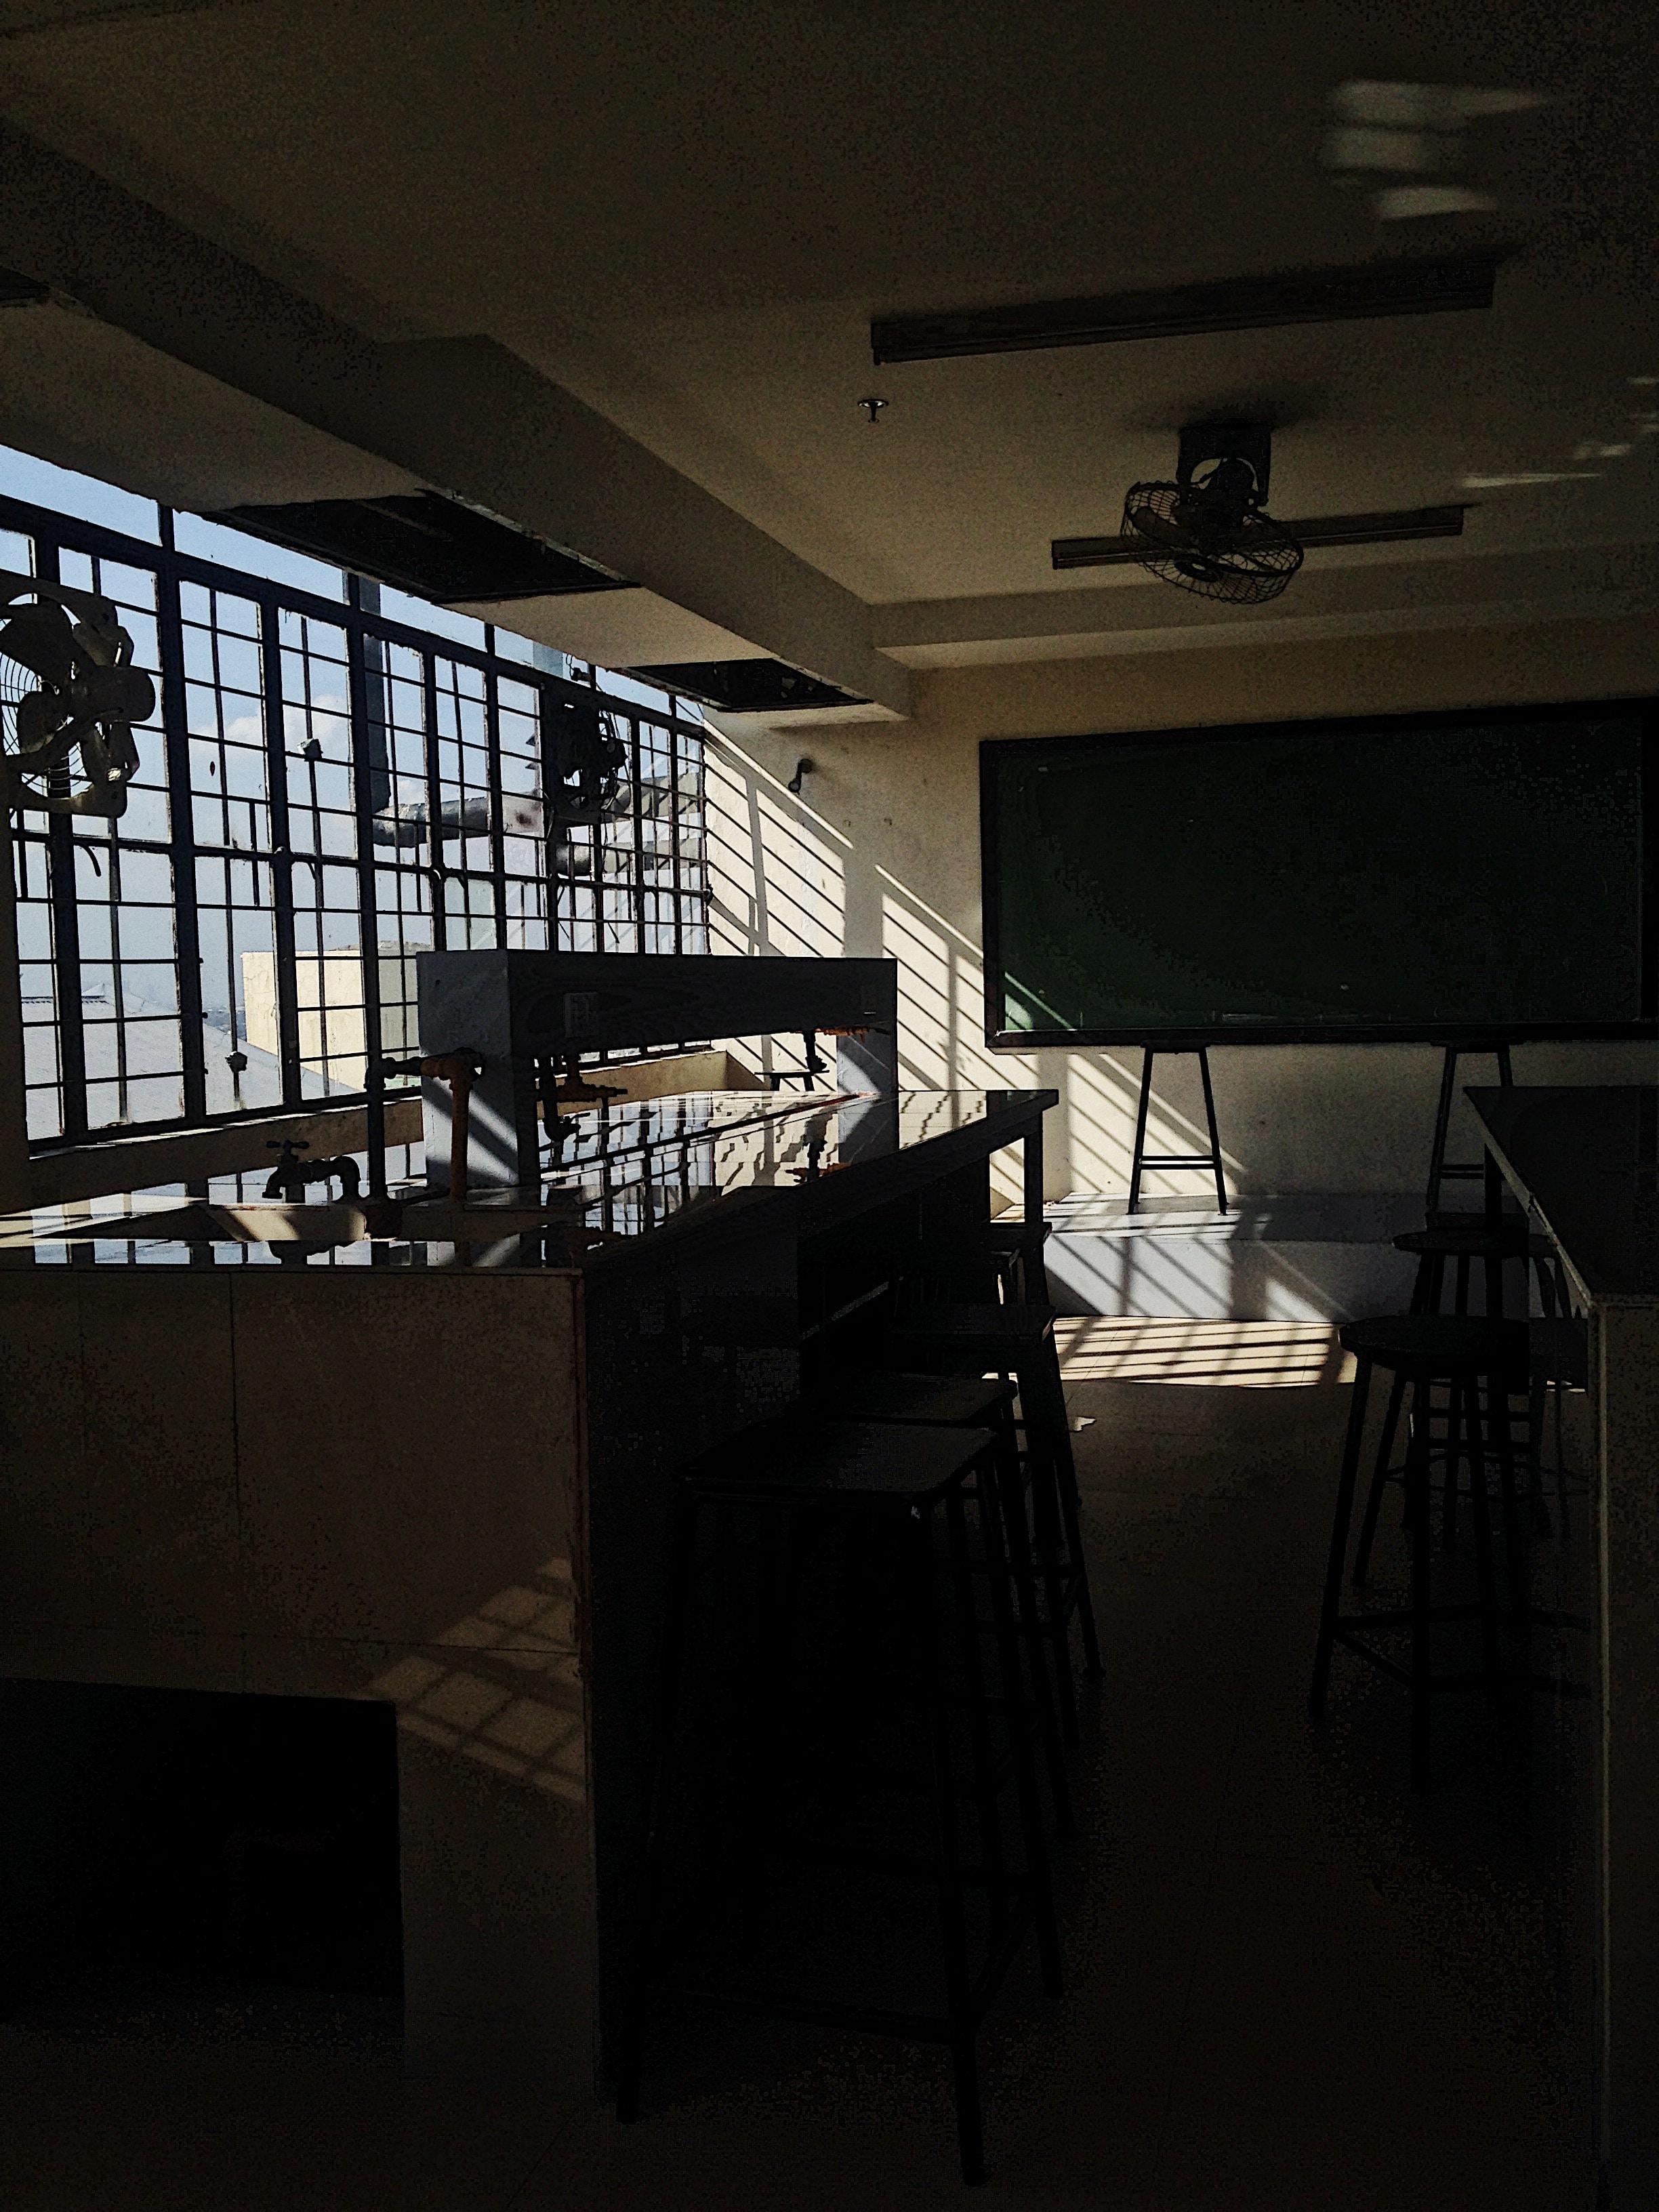 laboratory classroom during daytime